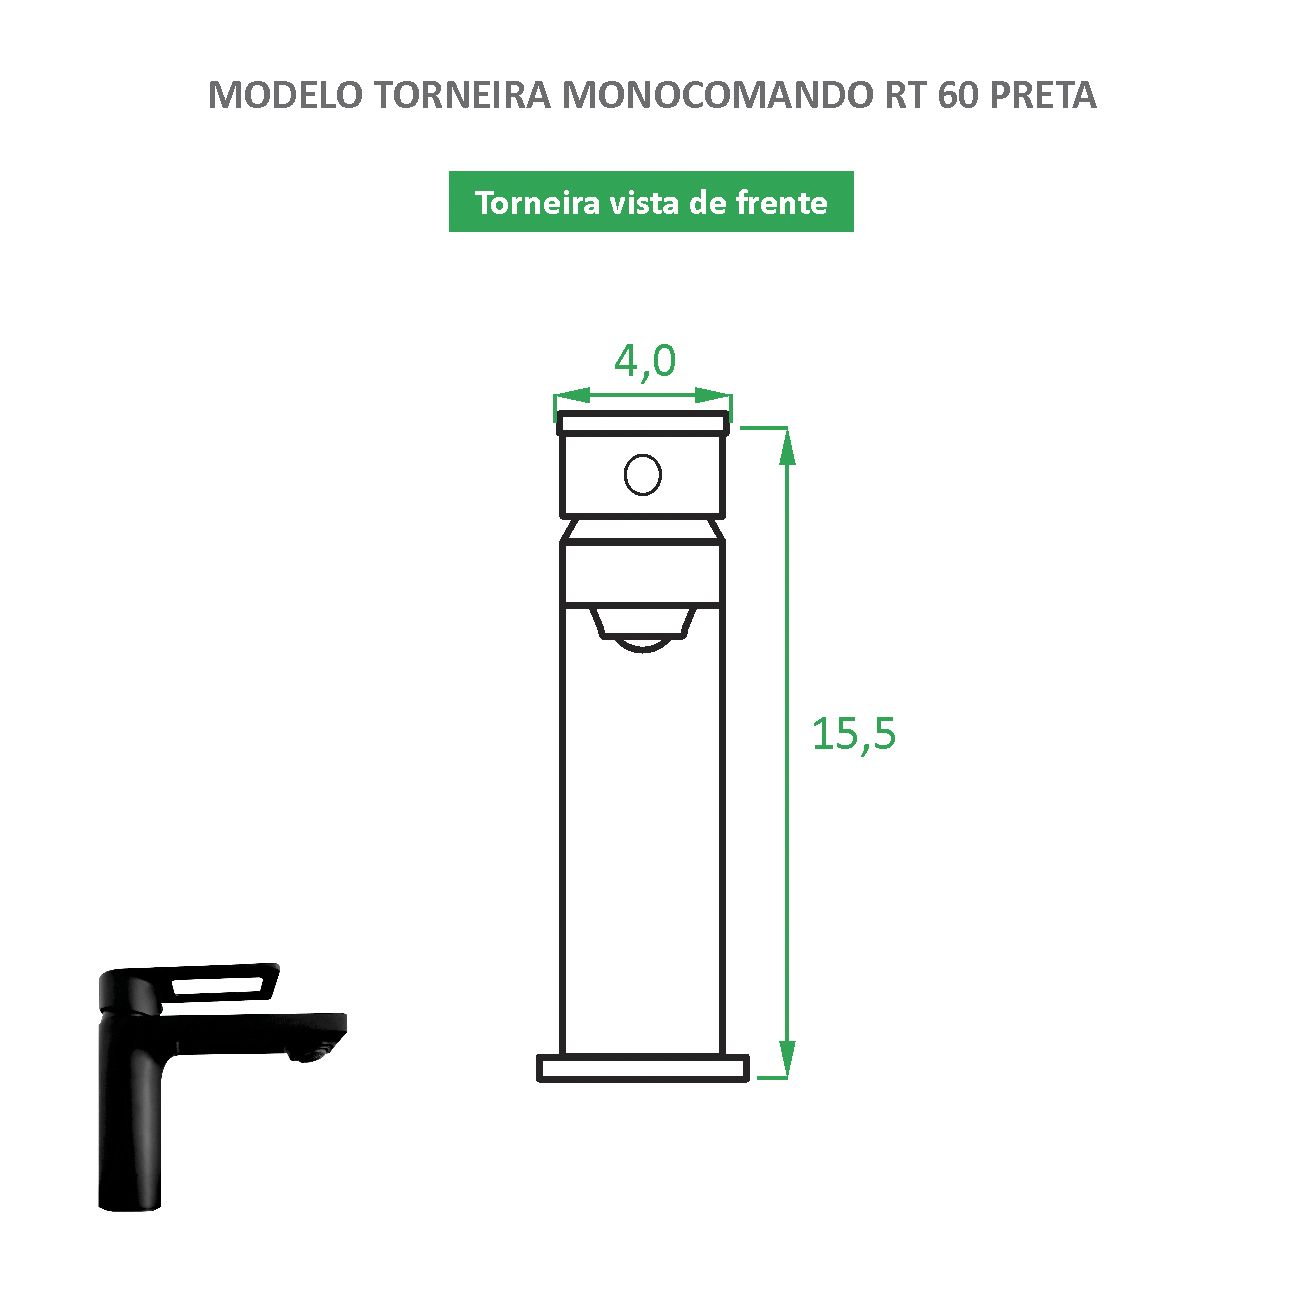 Torneira Monocomando Preta fosca RT 60